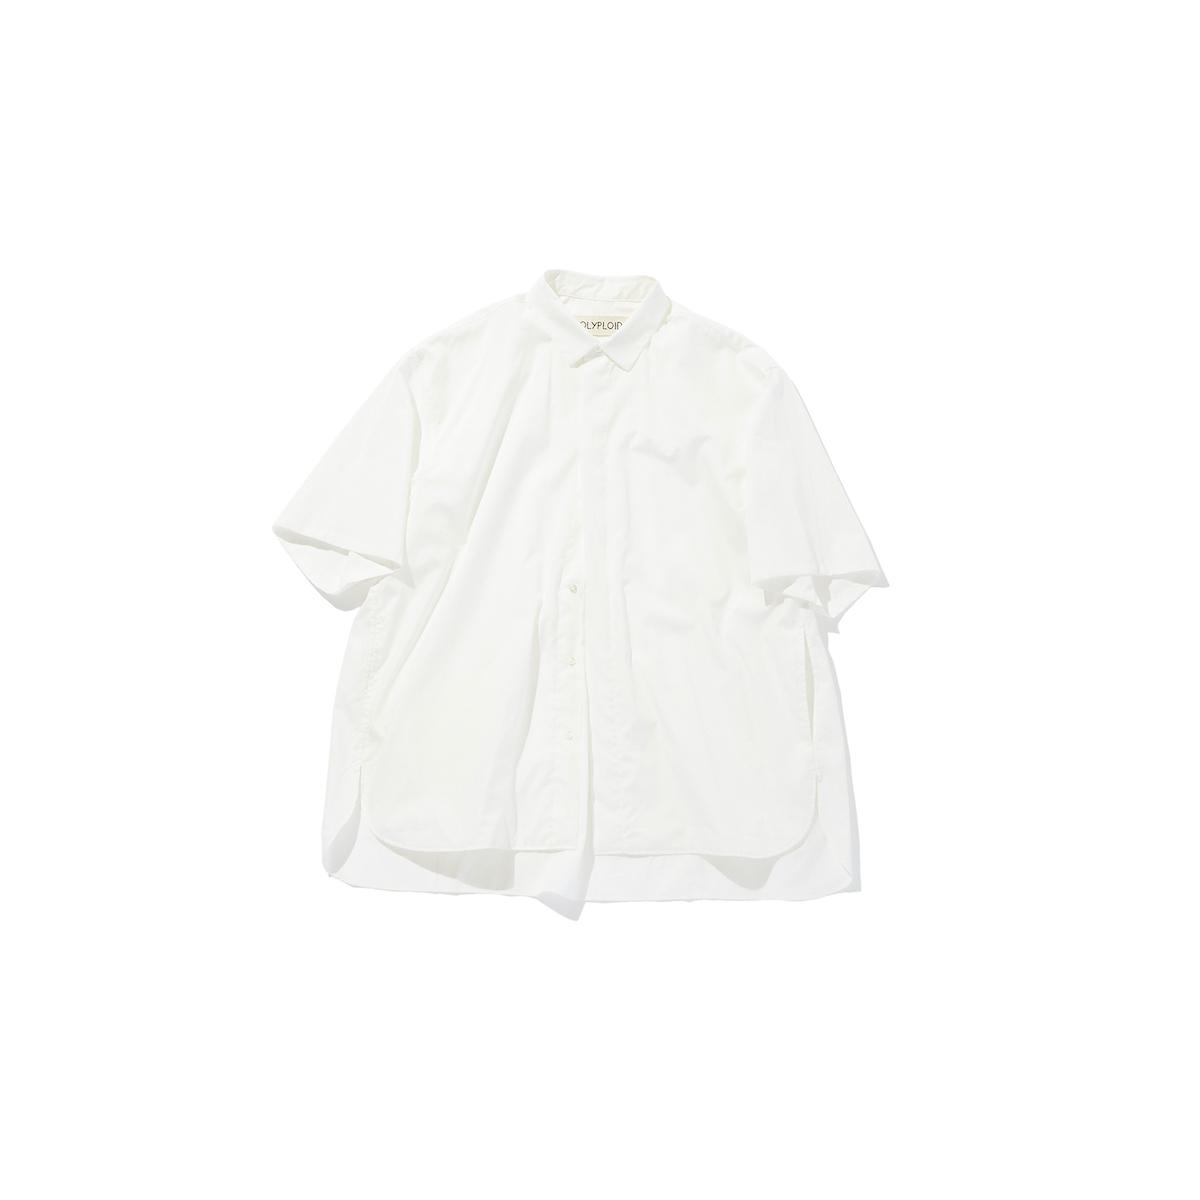 POLYPLOID 「 SHORT SLEEVE SHIRT TYPE-C / WHITE 」